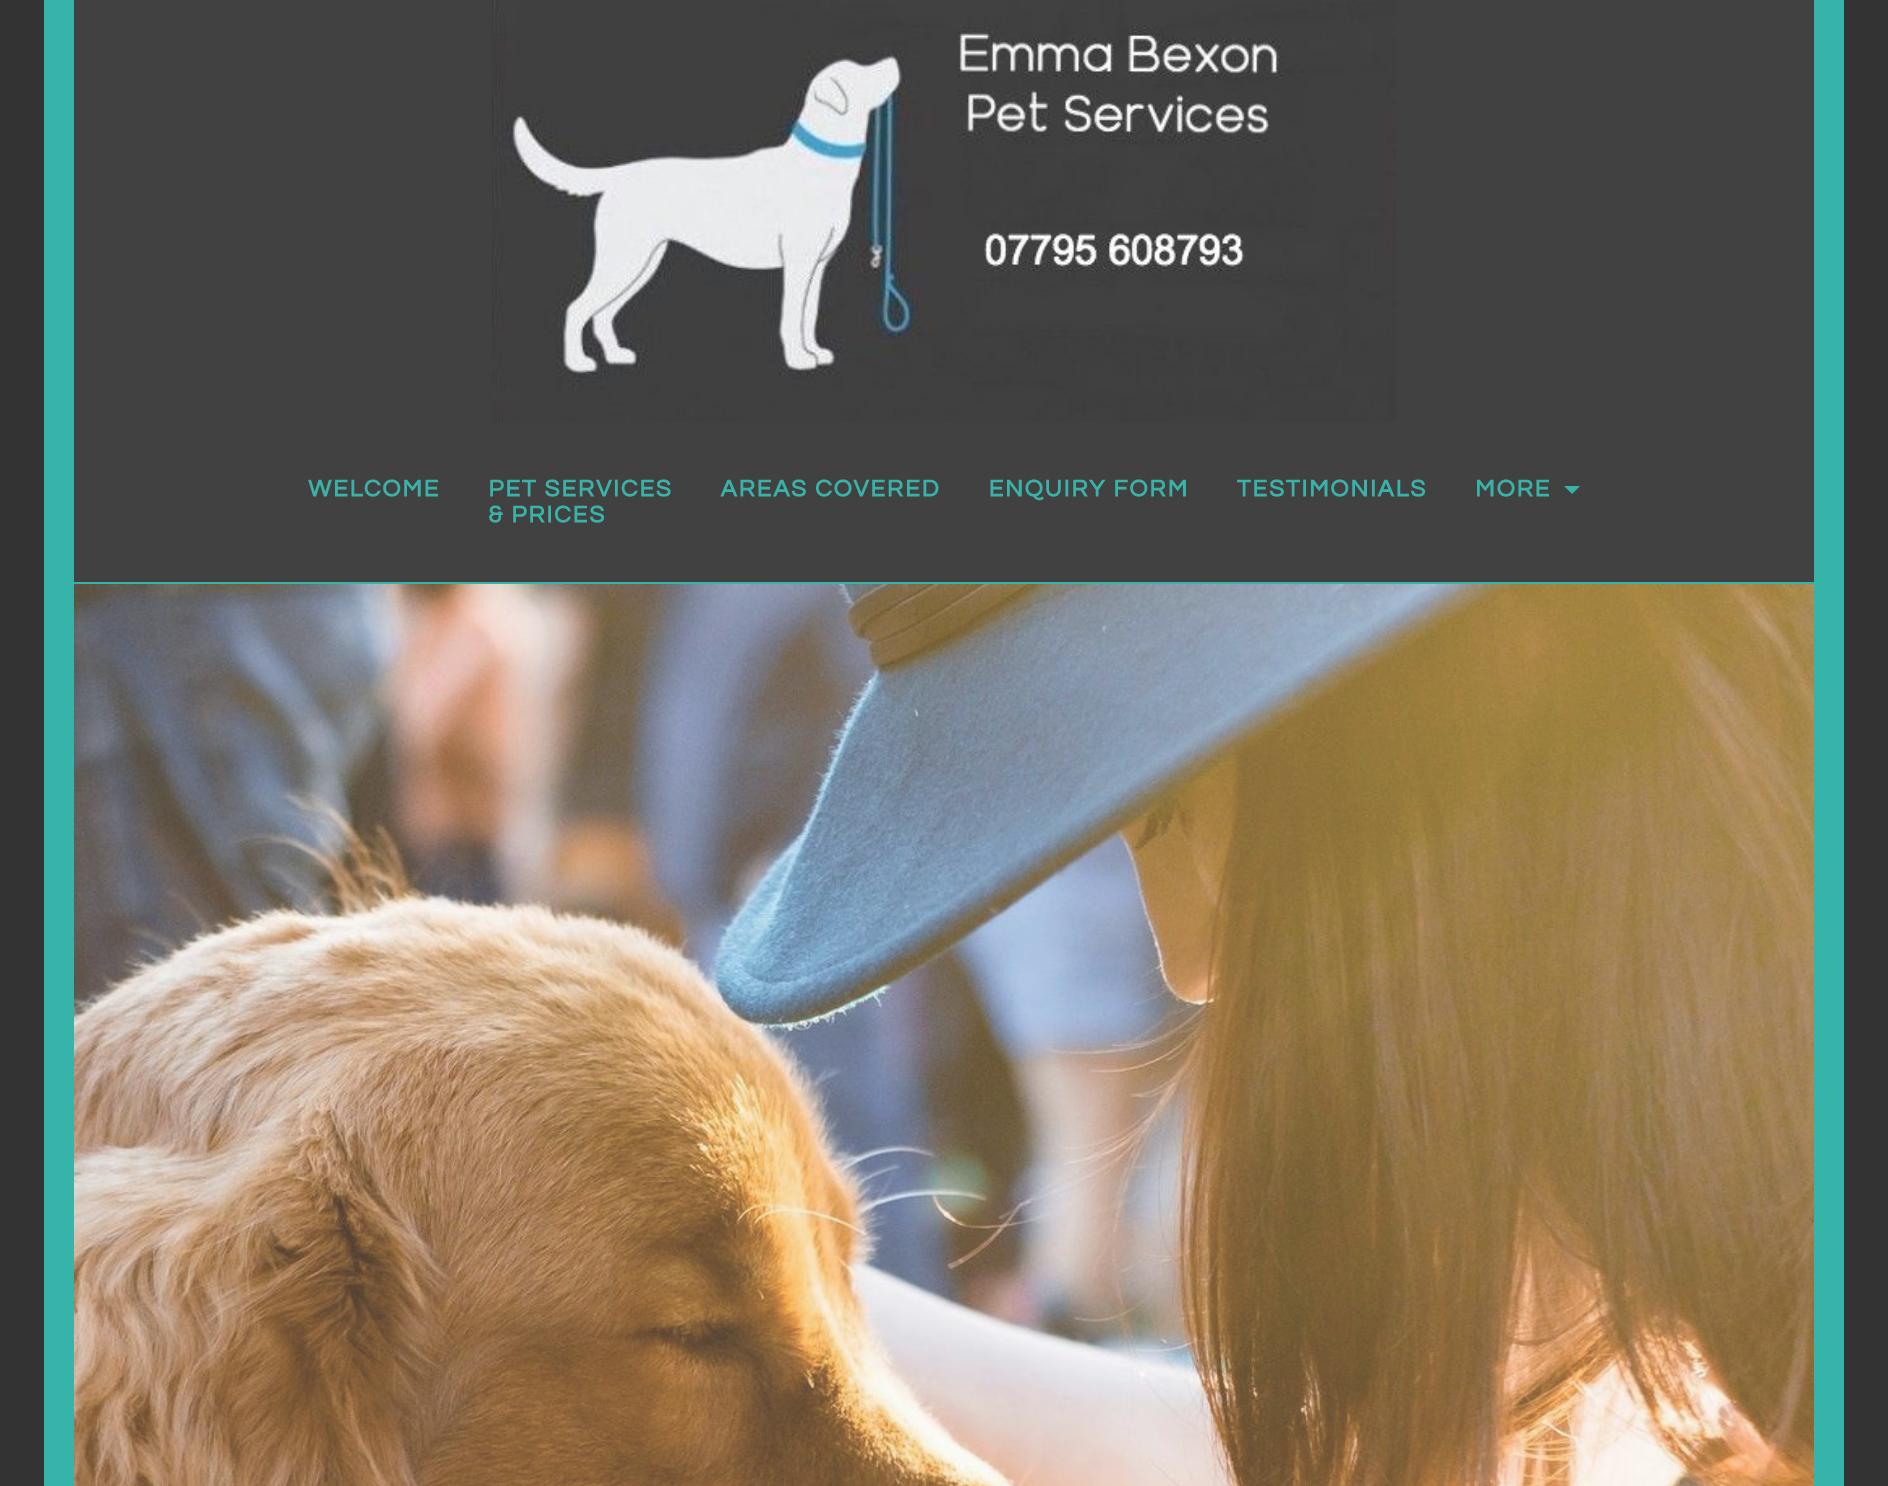 Emma Bexon Pet Services